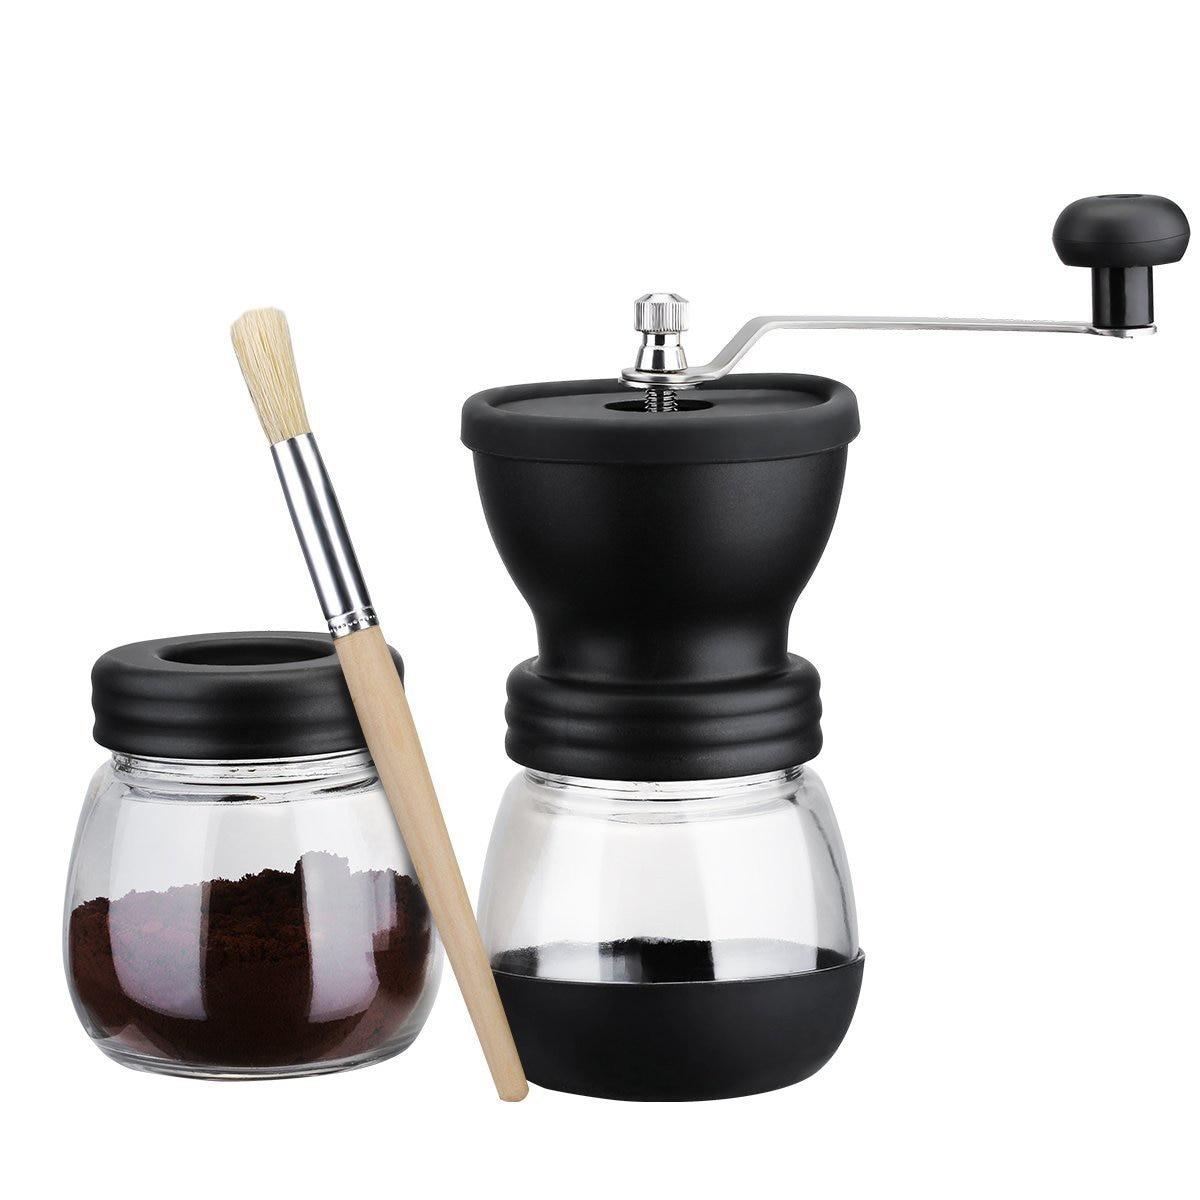 Hot Sale Manual Coffee Grinder with Storage Jar ,Soft brush , Conical Ceramic Burr Quiet and Portable gisela graham hen ceramic jar set pink